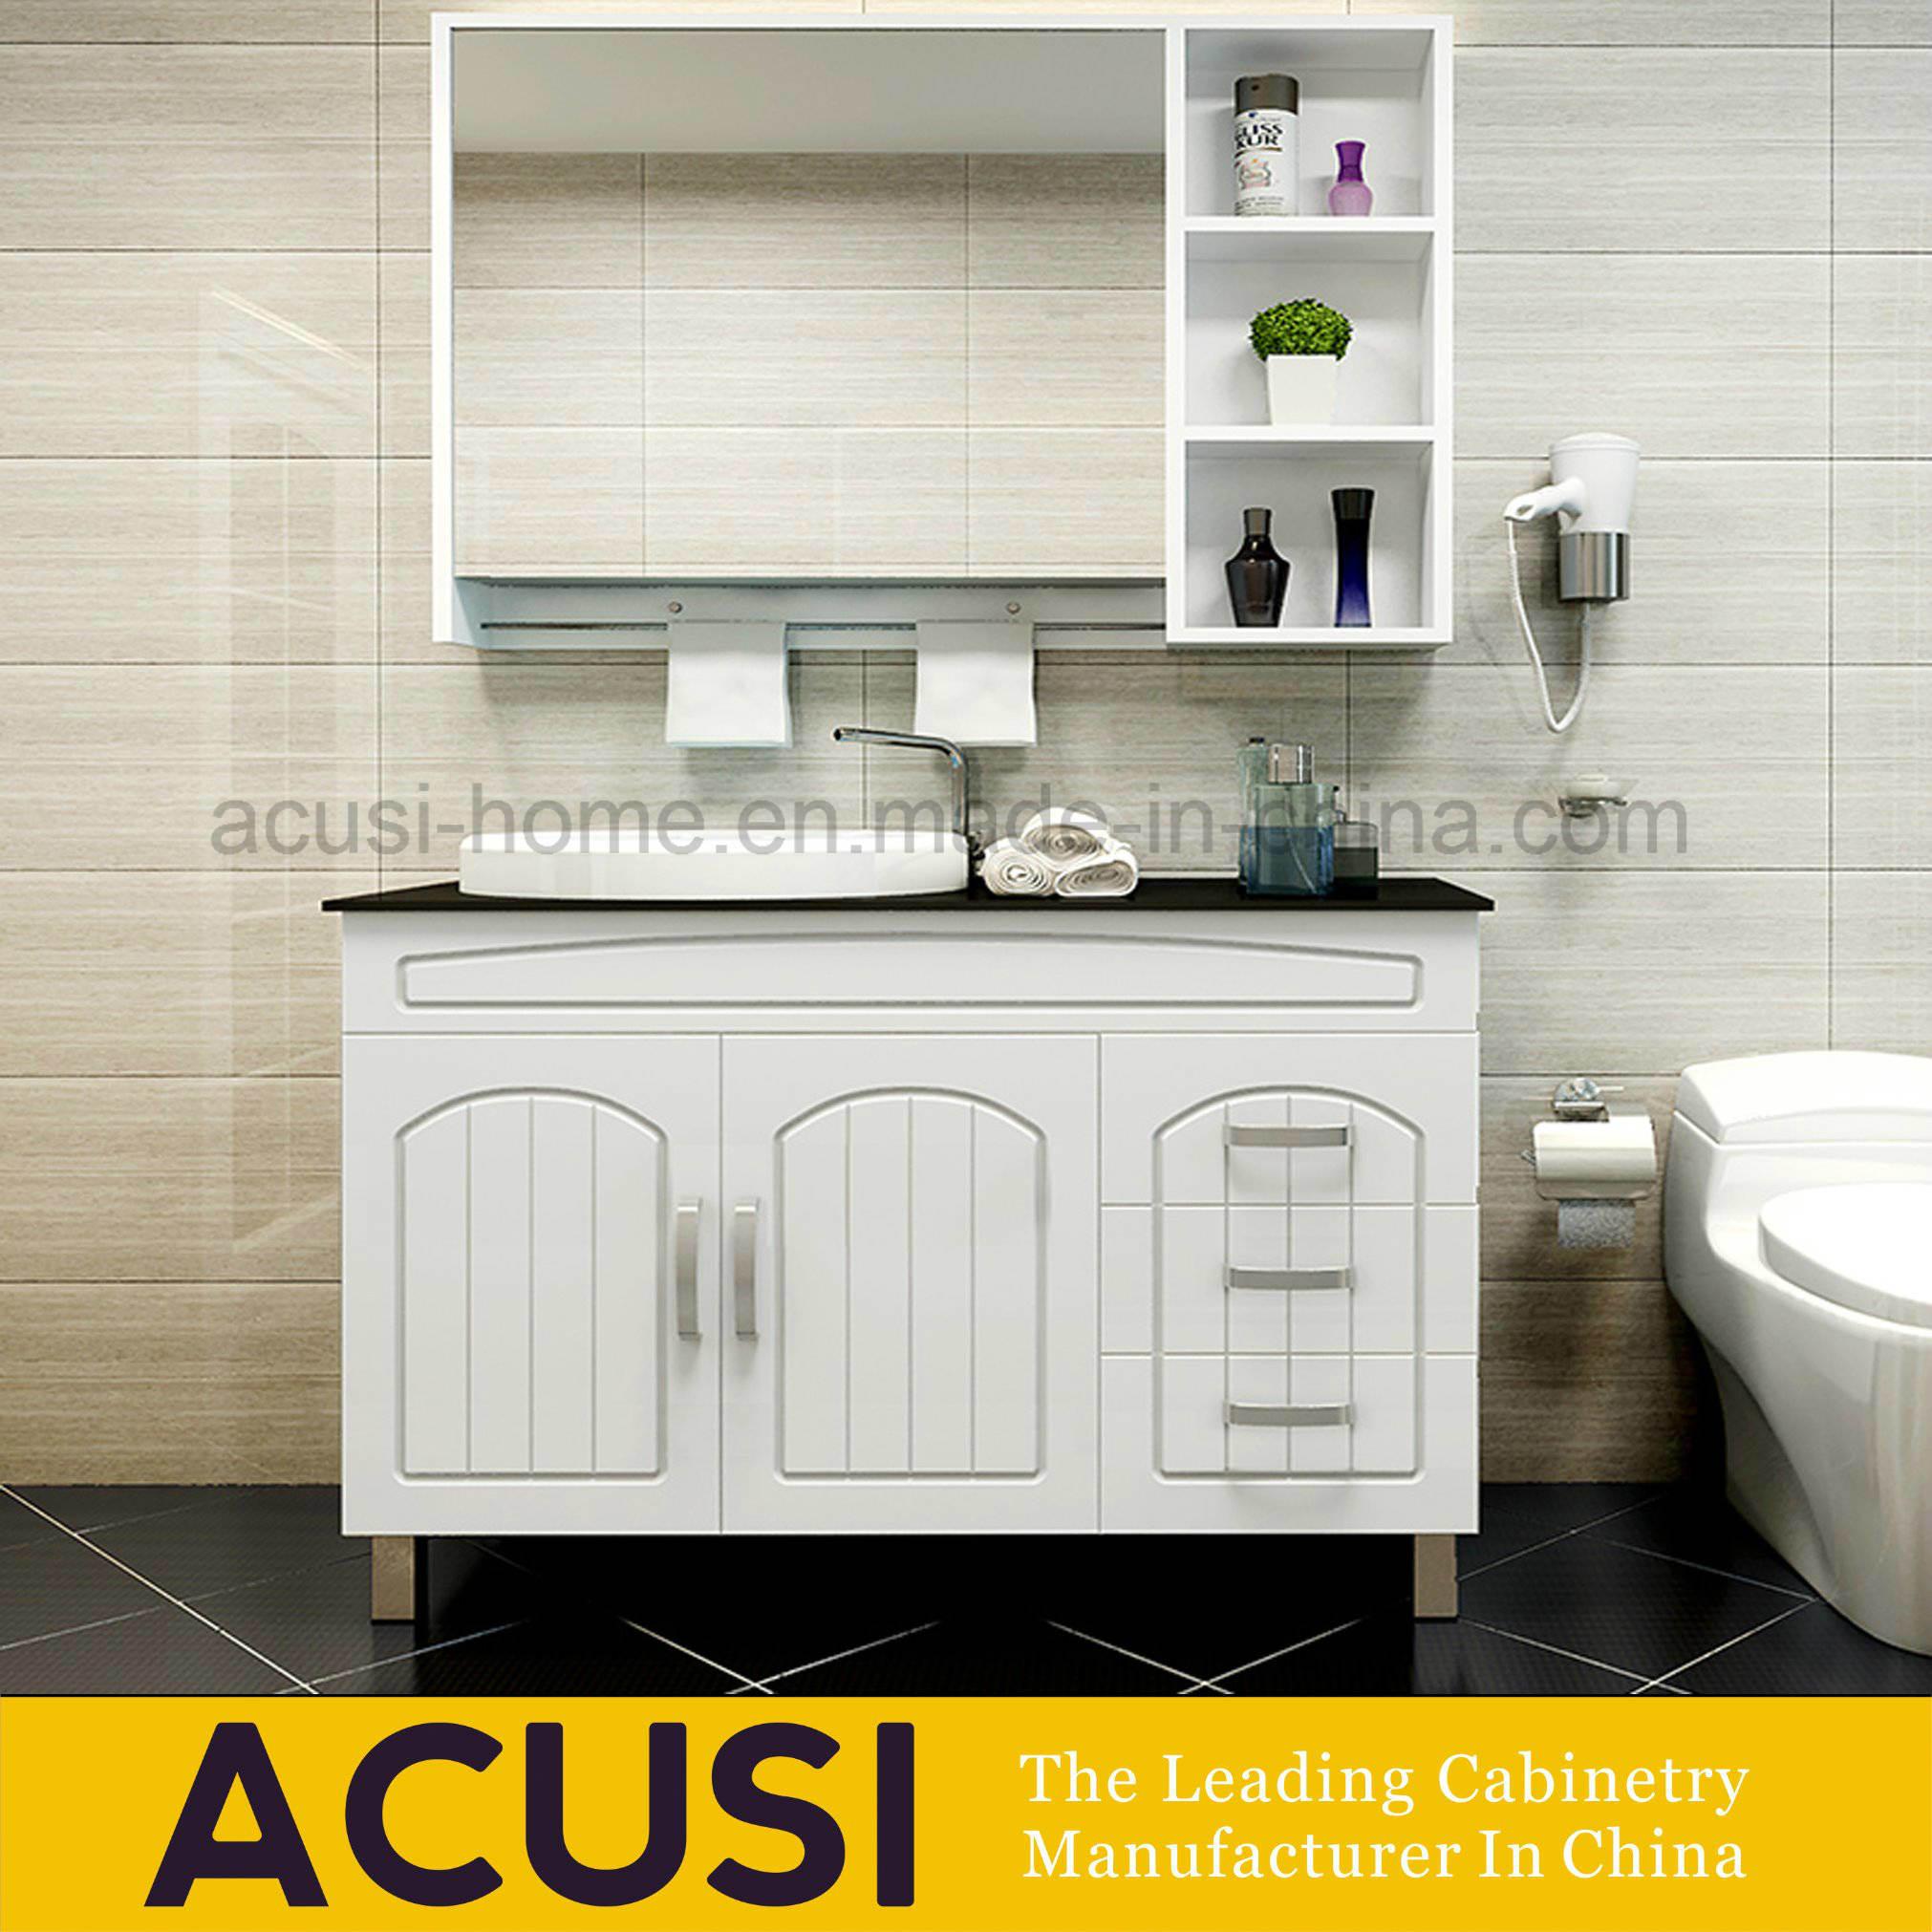 Home Goods Bath Vanity Vombo Acs1